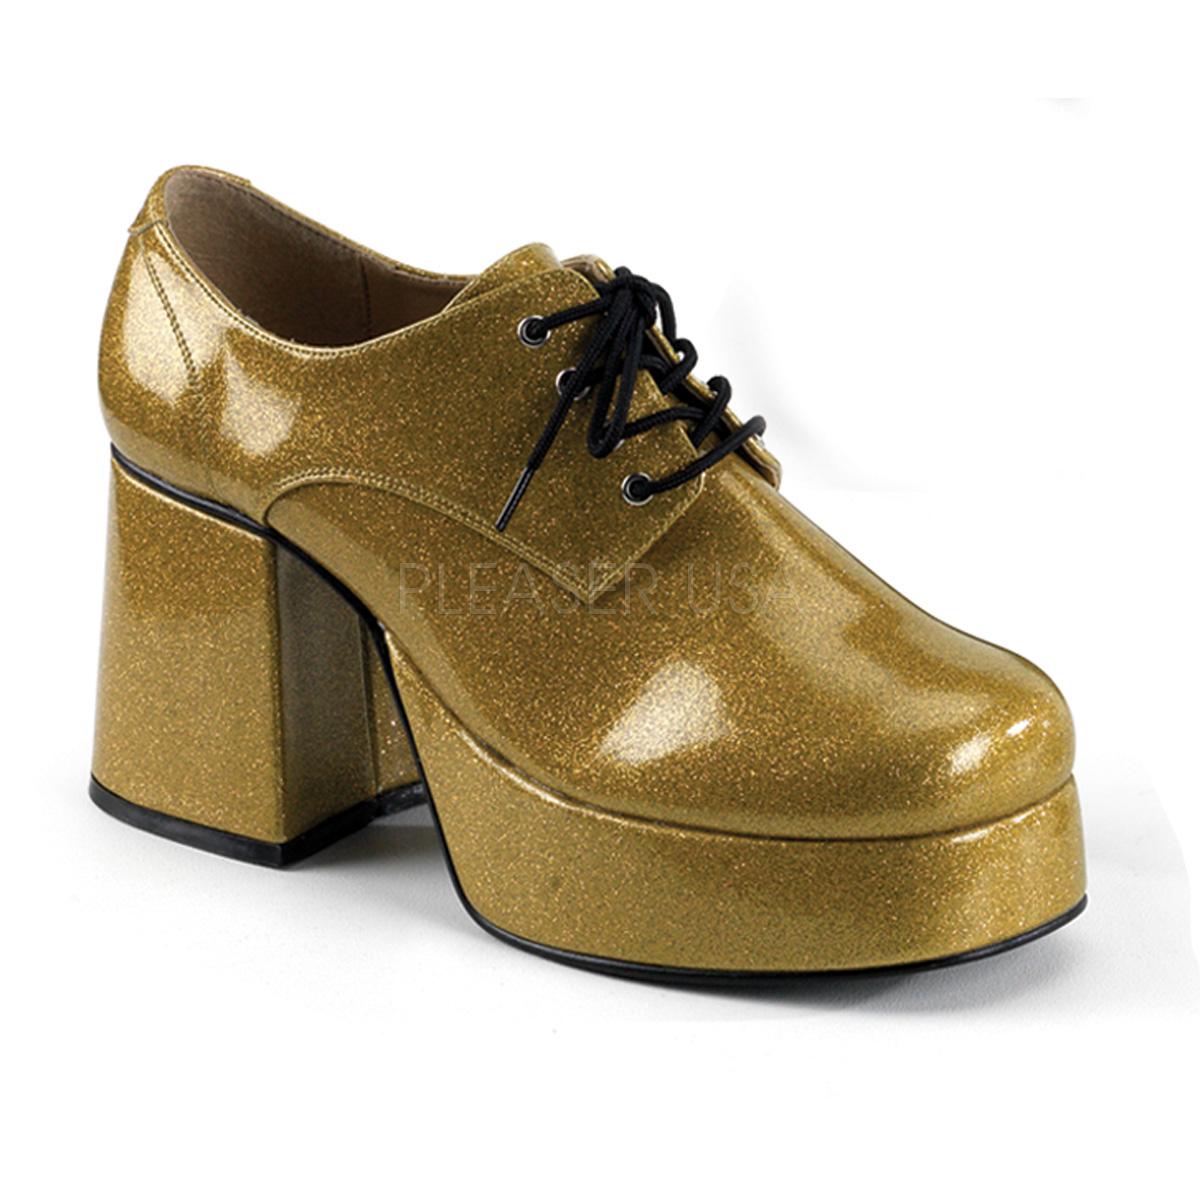 Funtasma JAZZ-02G 3 1/2inch #Men's Gold Glitter Platform Disco Shoes◆取り寄せ